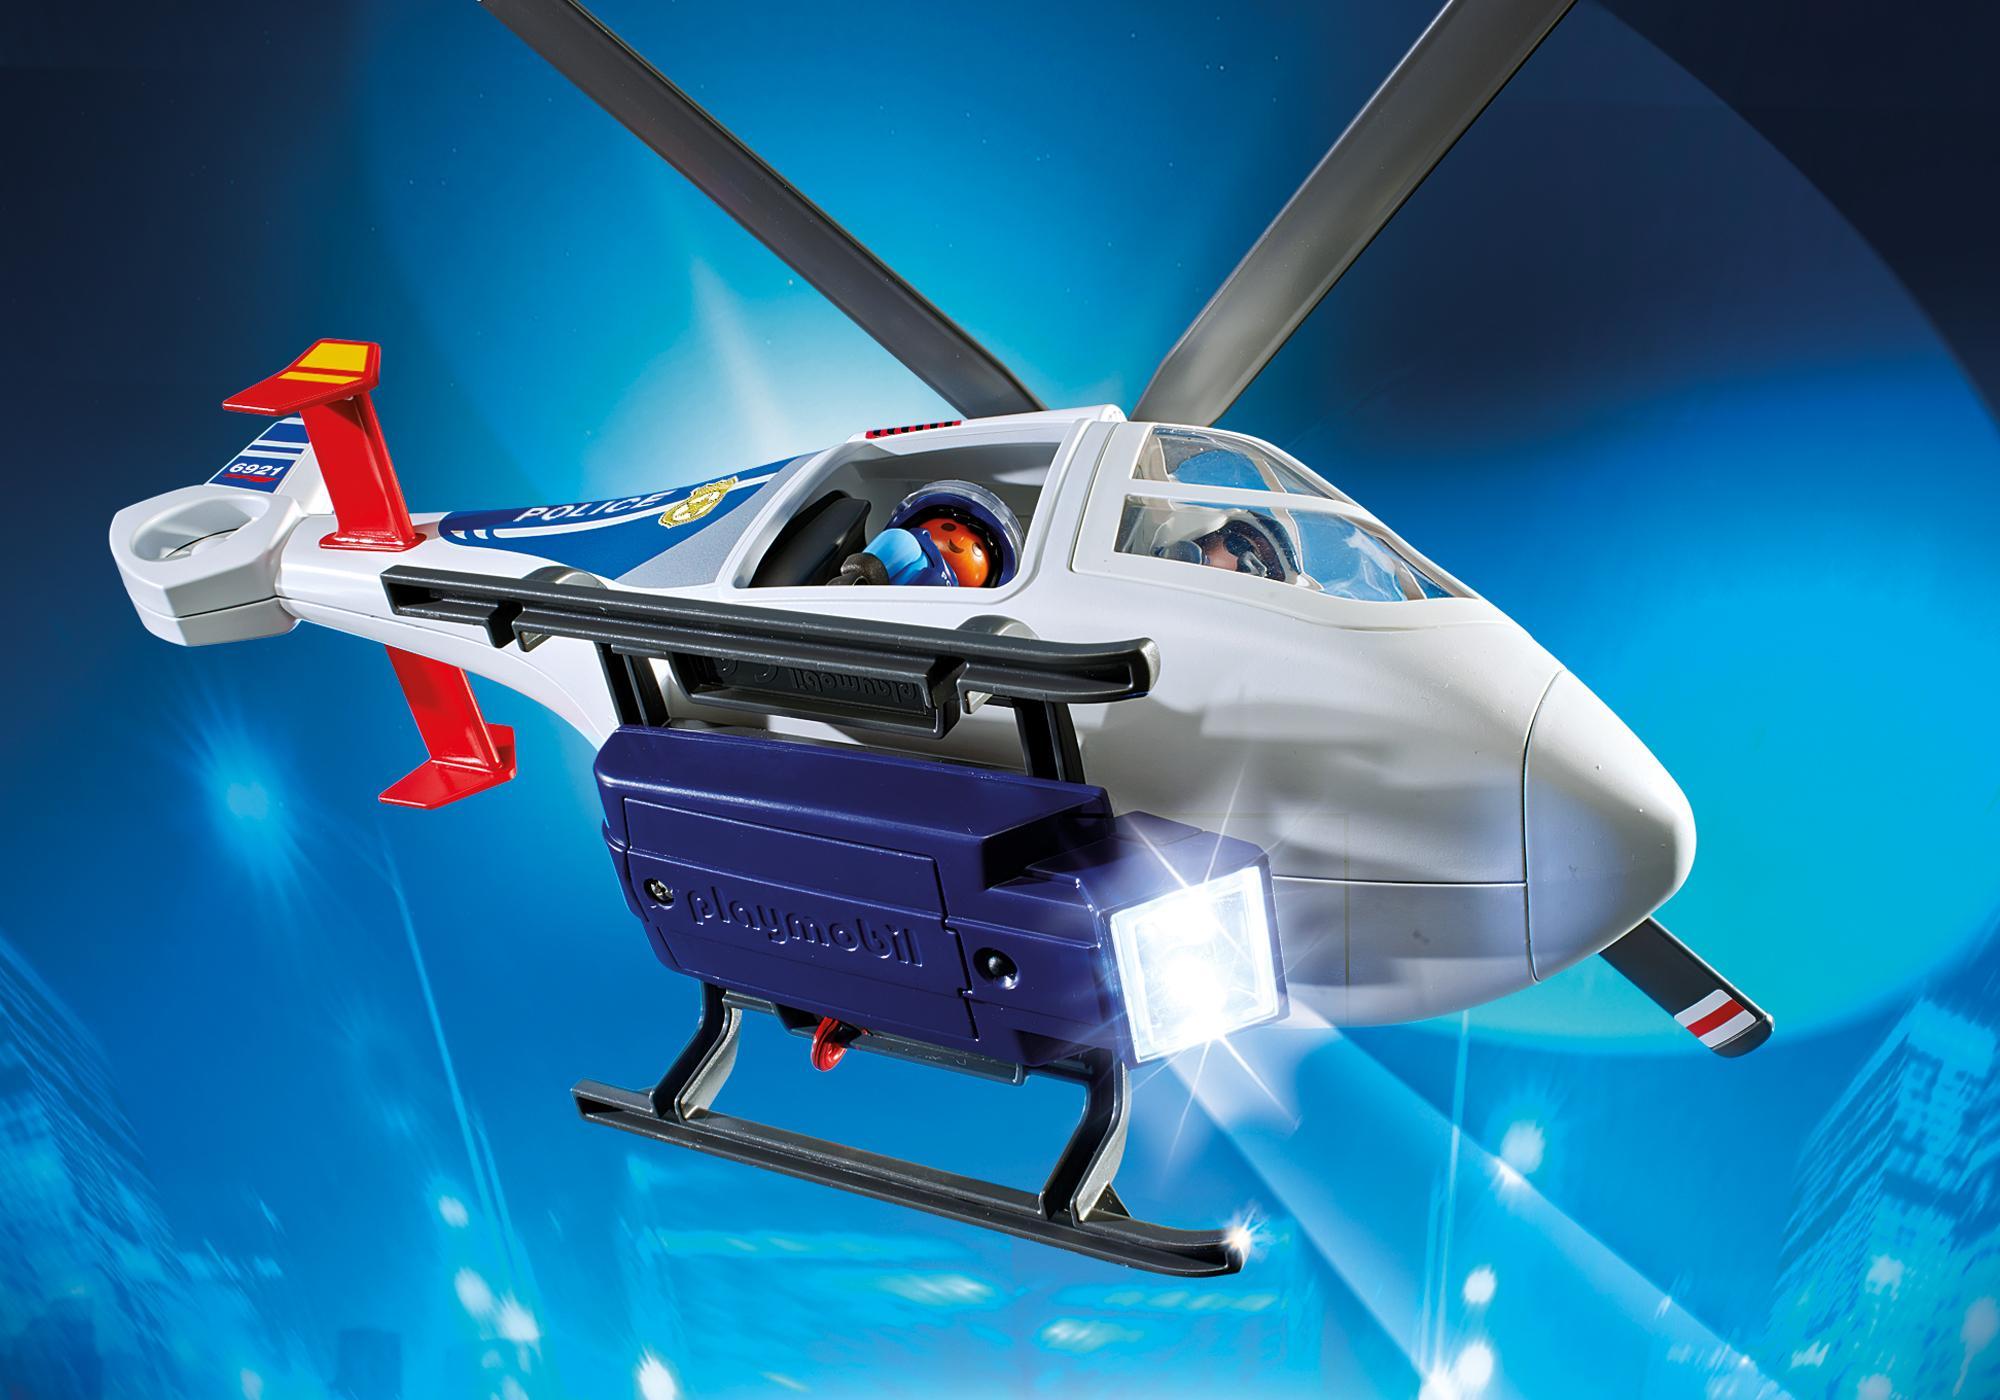 http://media.playmobil.com/i/playmobil/6921_product_extra3/Hélicoptère de police avec projecteur de recherche